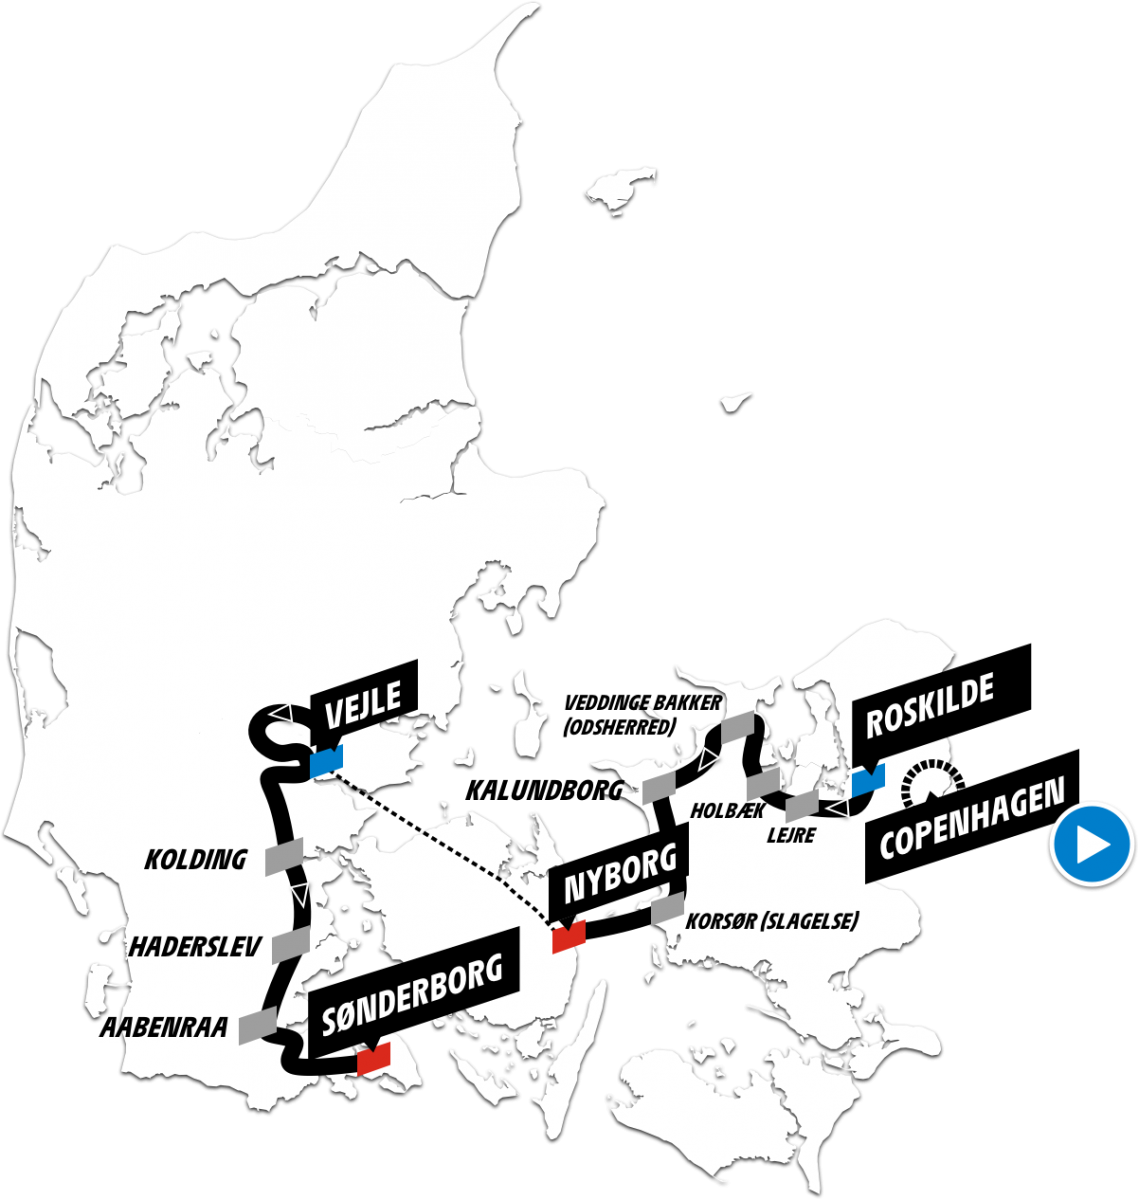 Tour de France in Denemarken